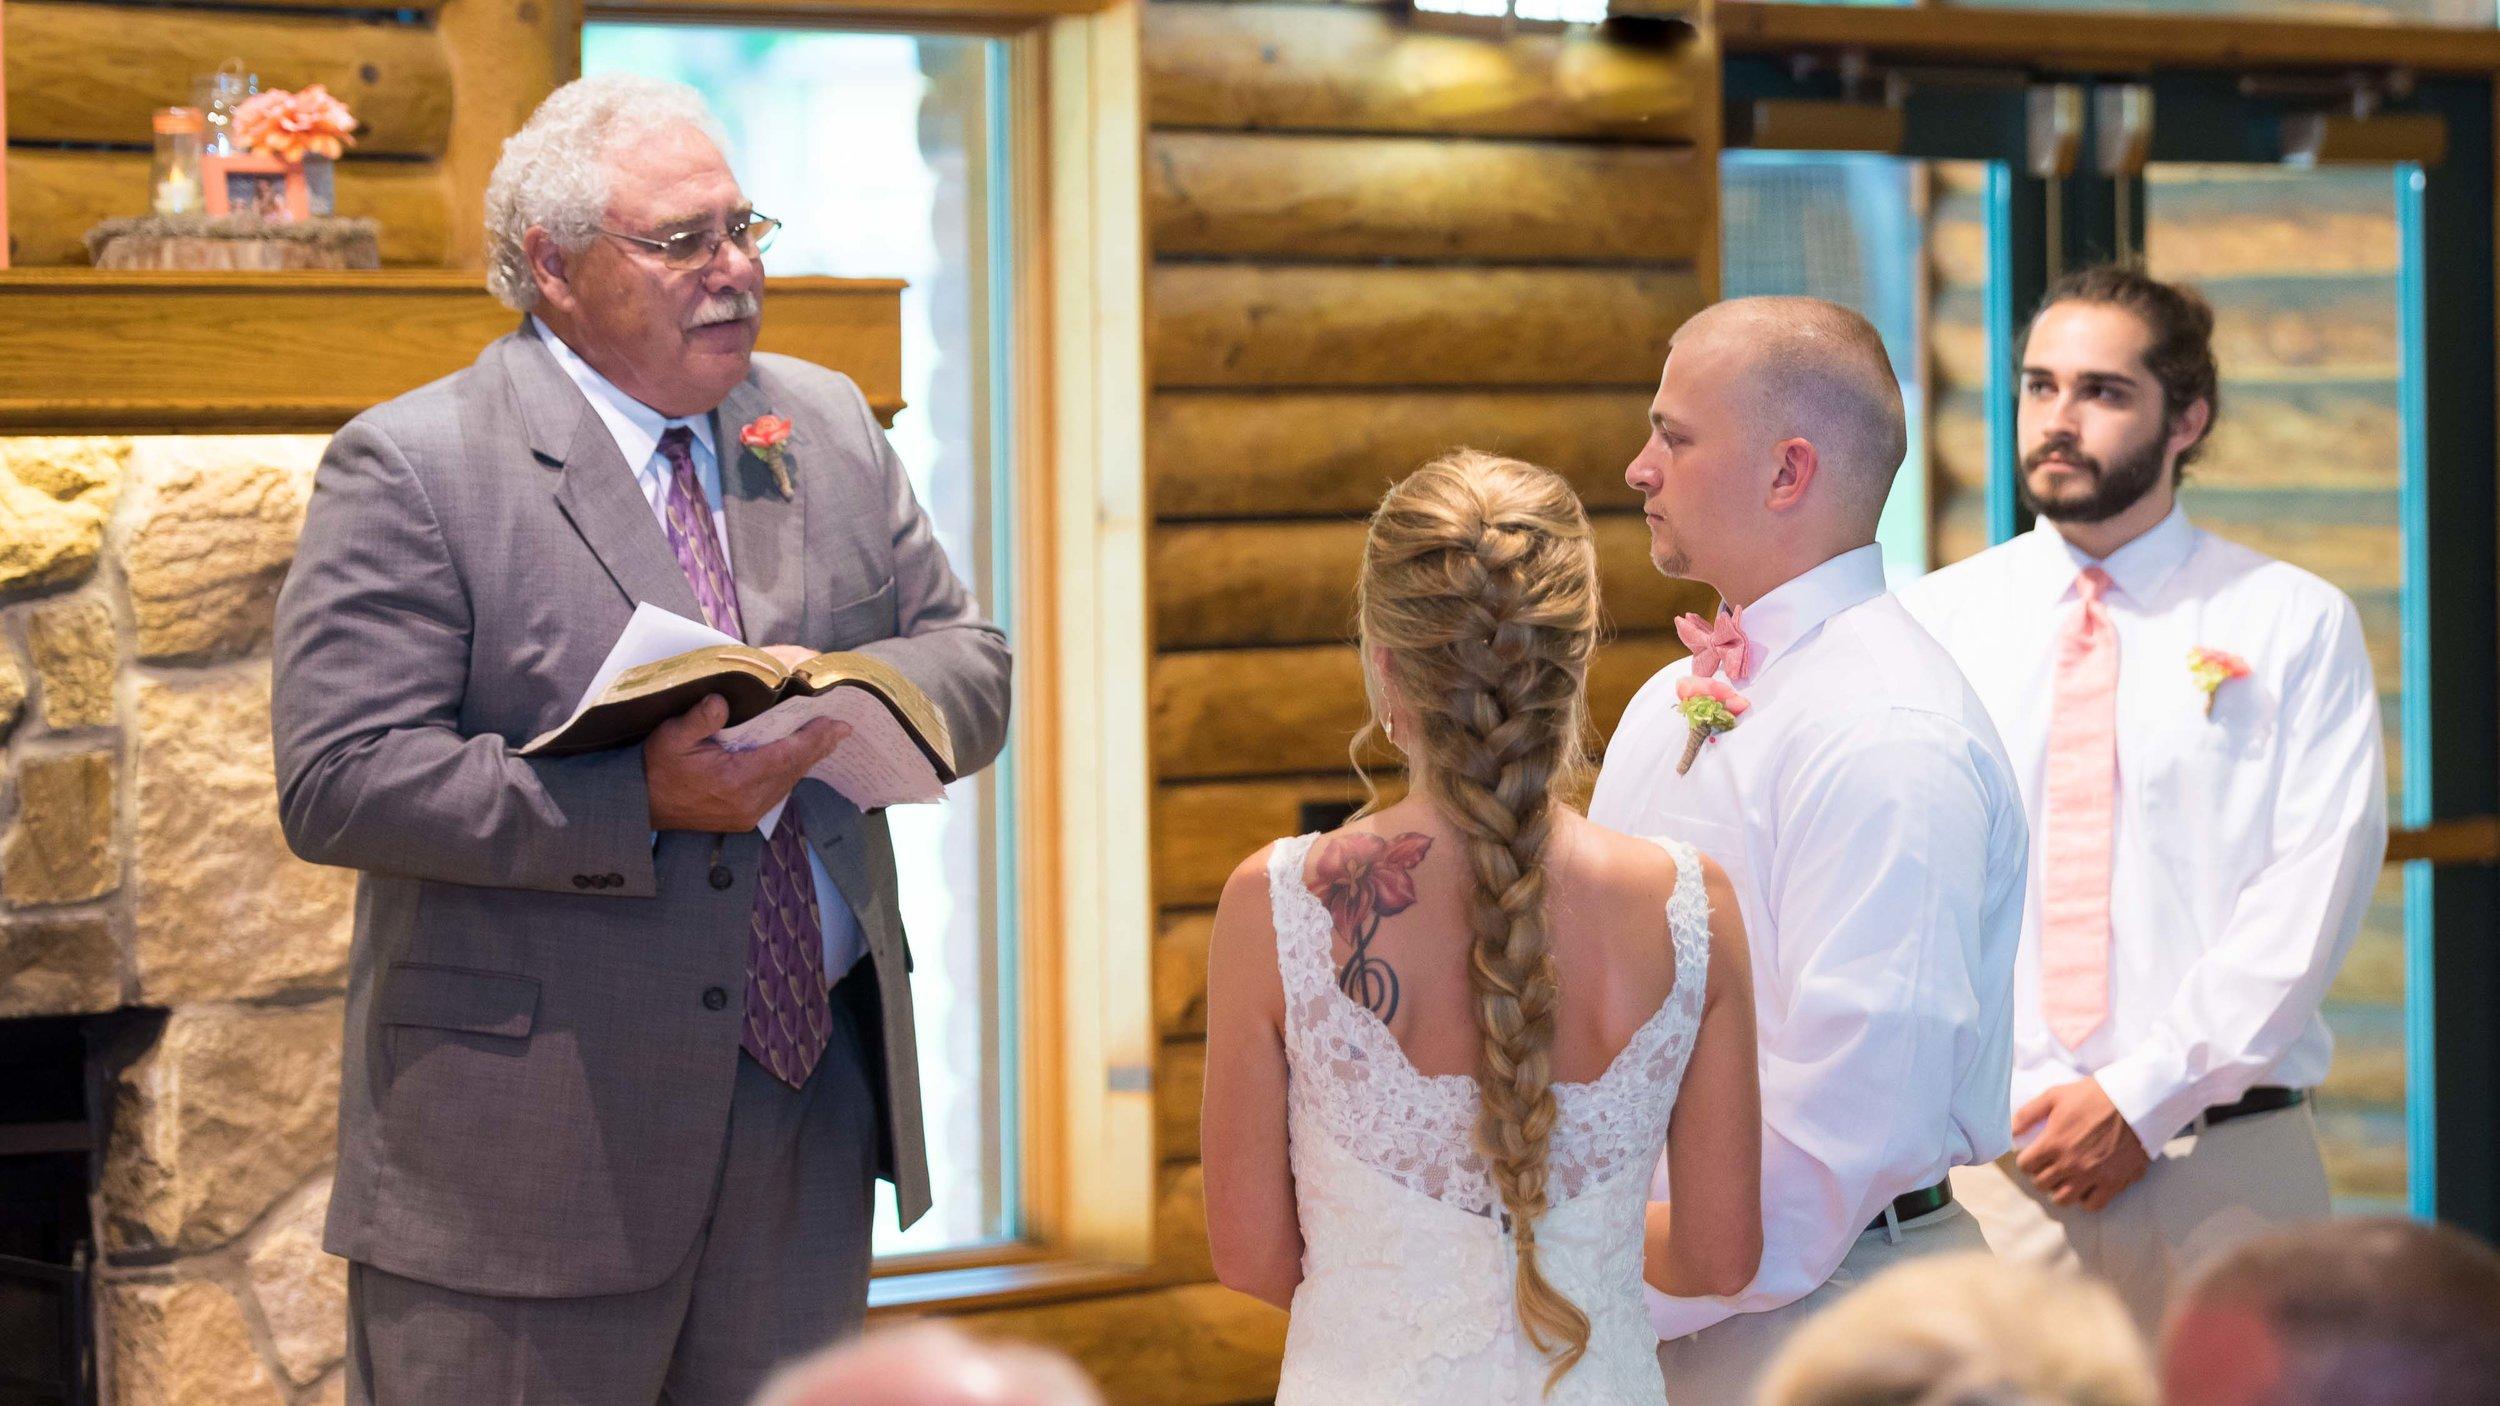 Wedding-ceremony-mayernik-center-1.jpg